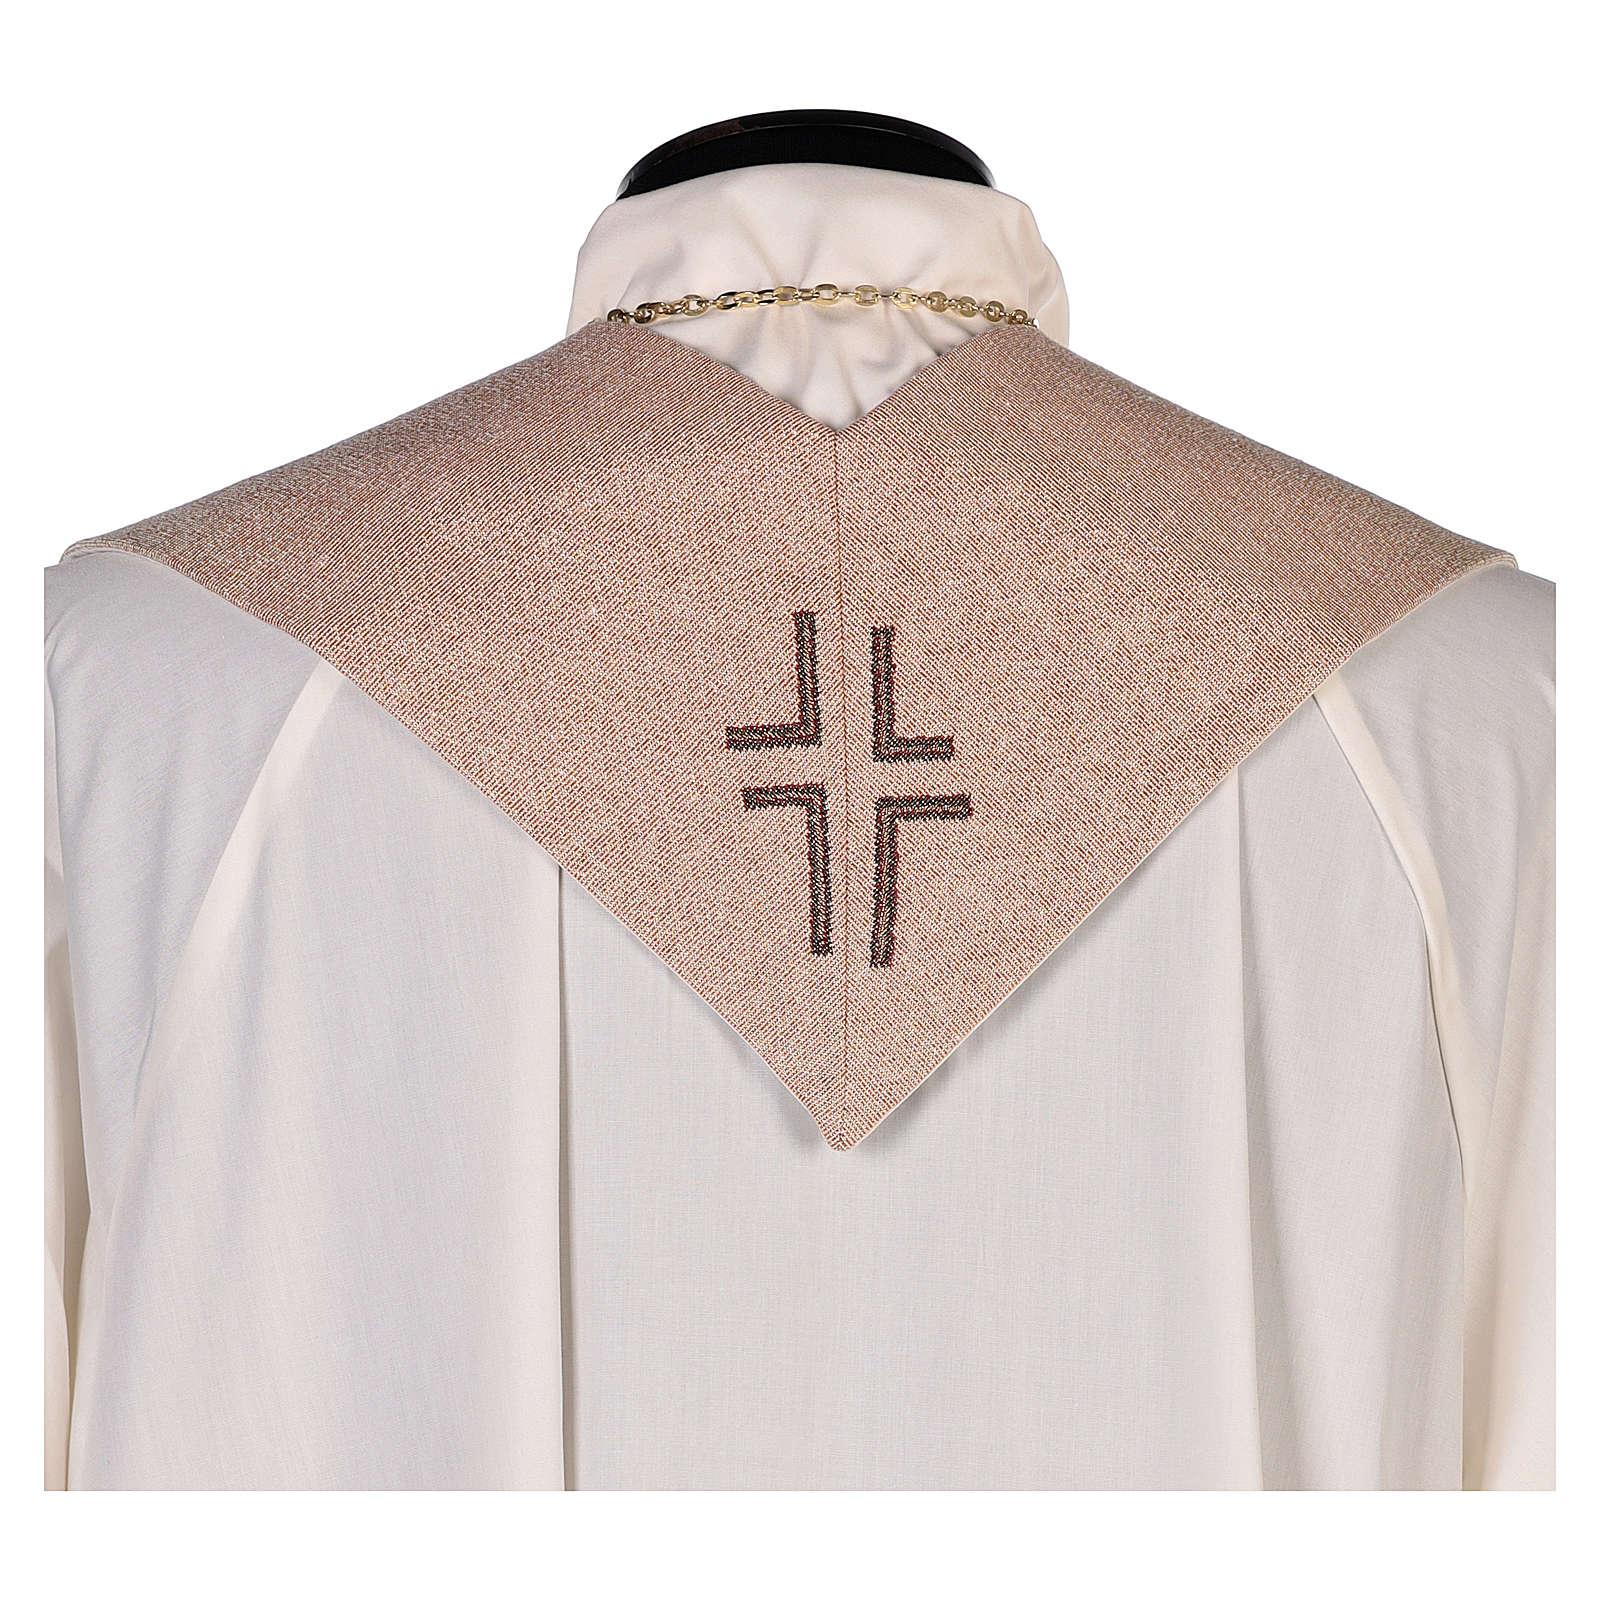 Stola Gesù Misericordioso croce sfumature pesca avorio 4